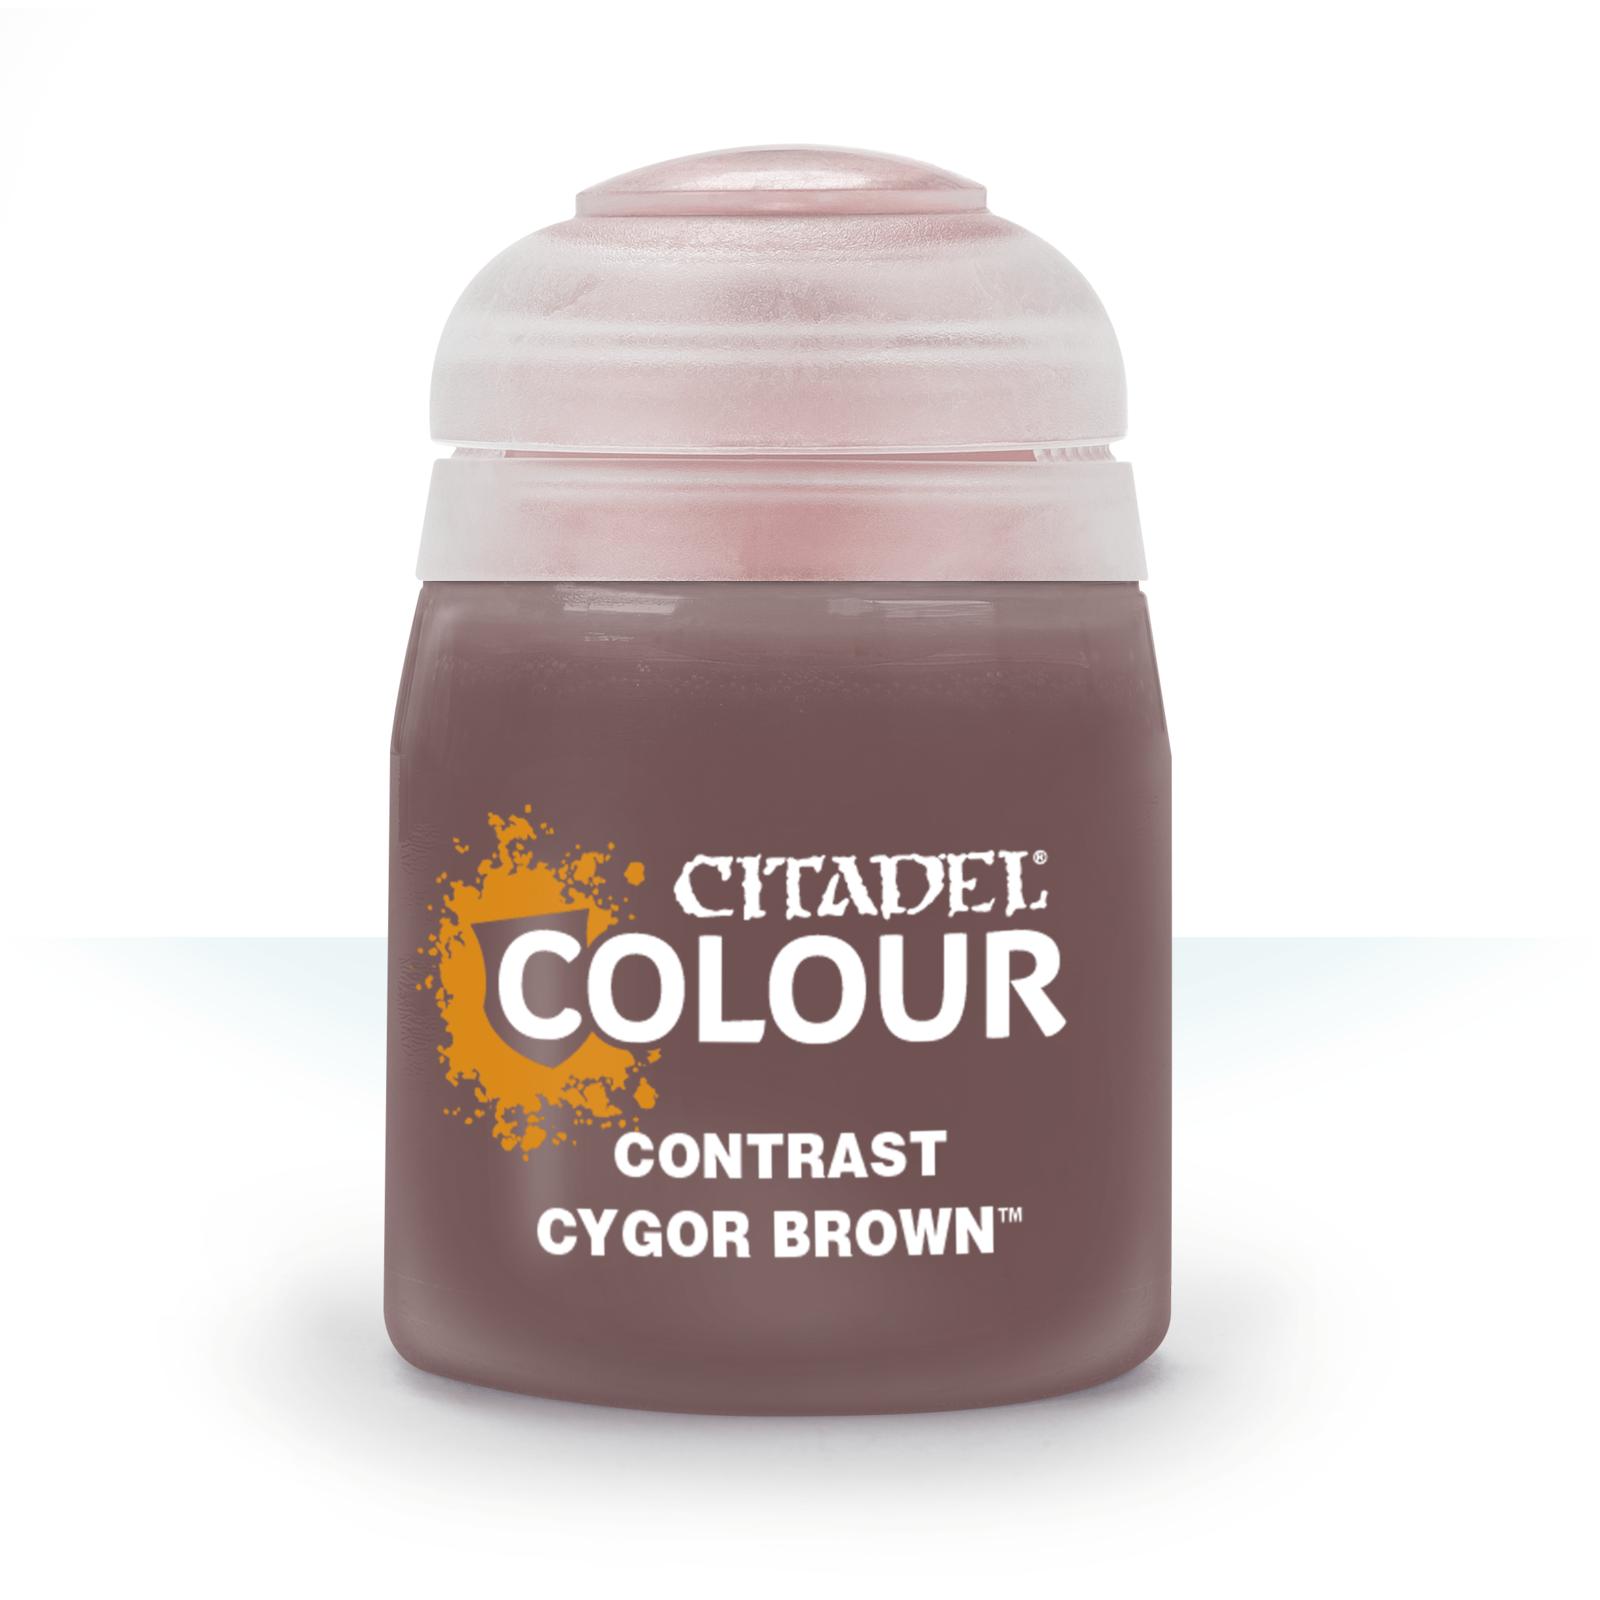 29-29 Contrast Cygor Brown 18ml